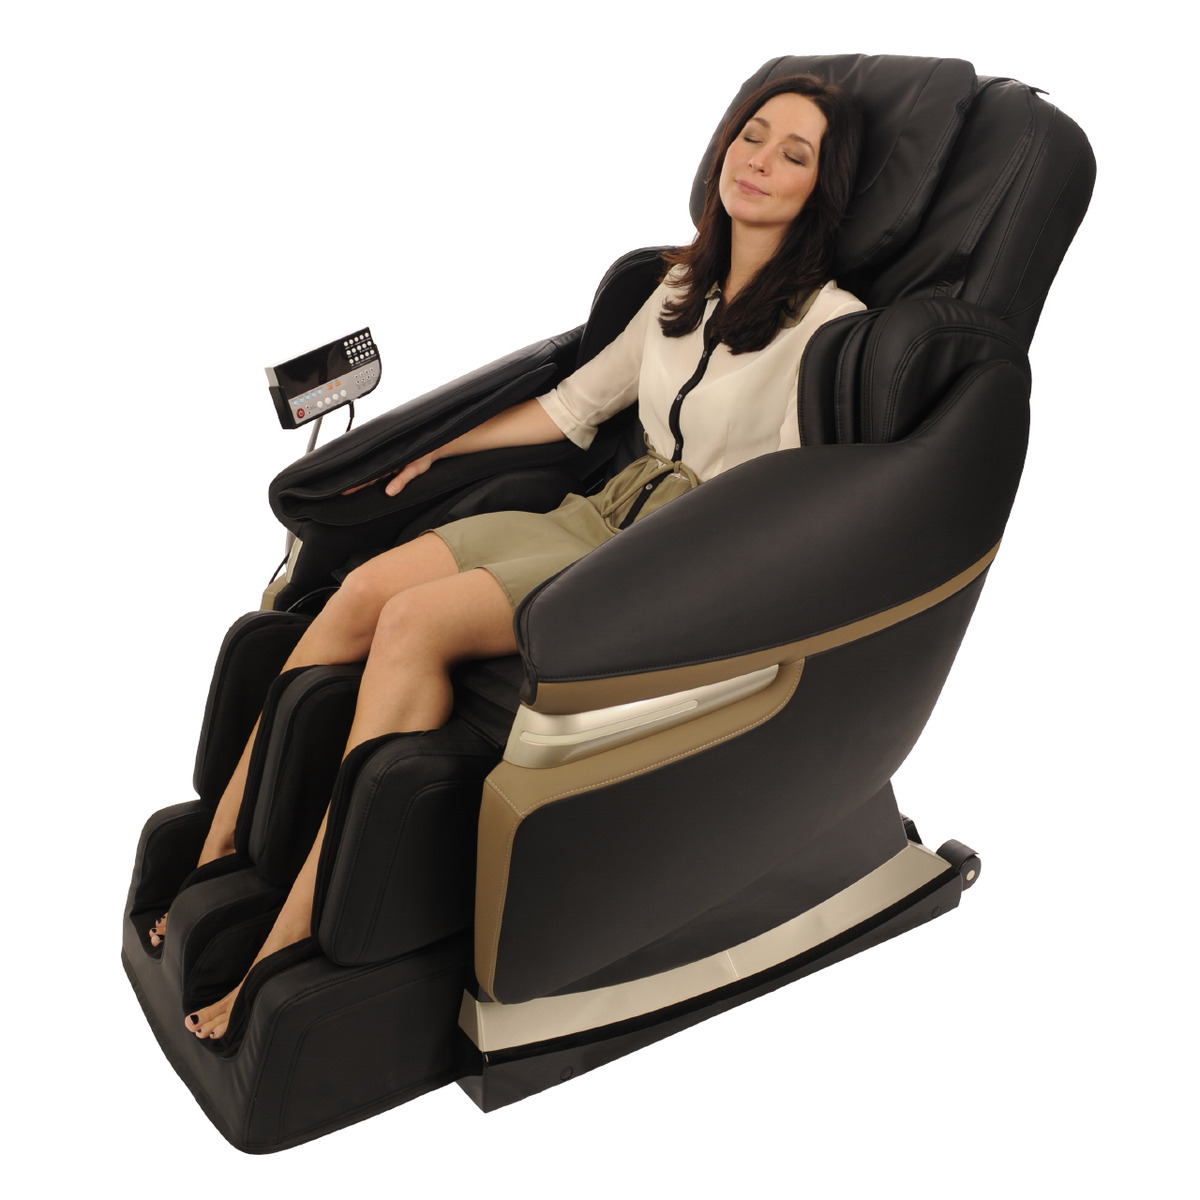 Affordable Massage Chairs North Carolina